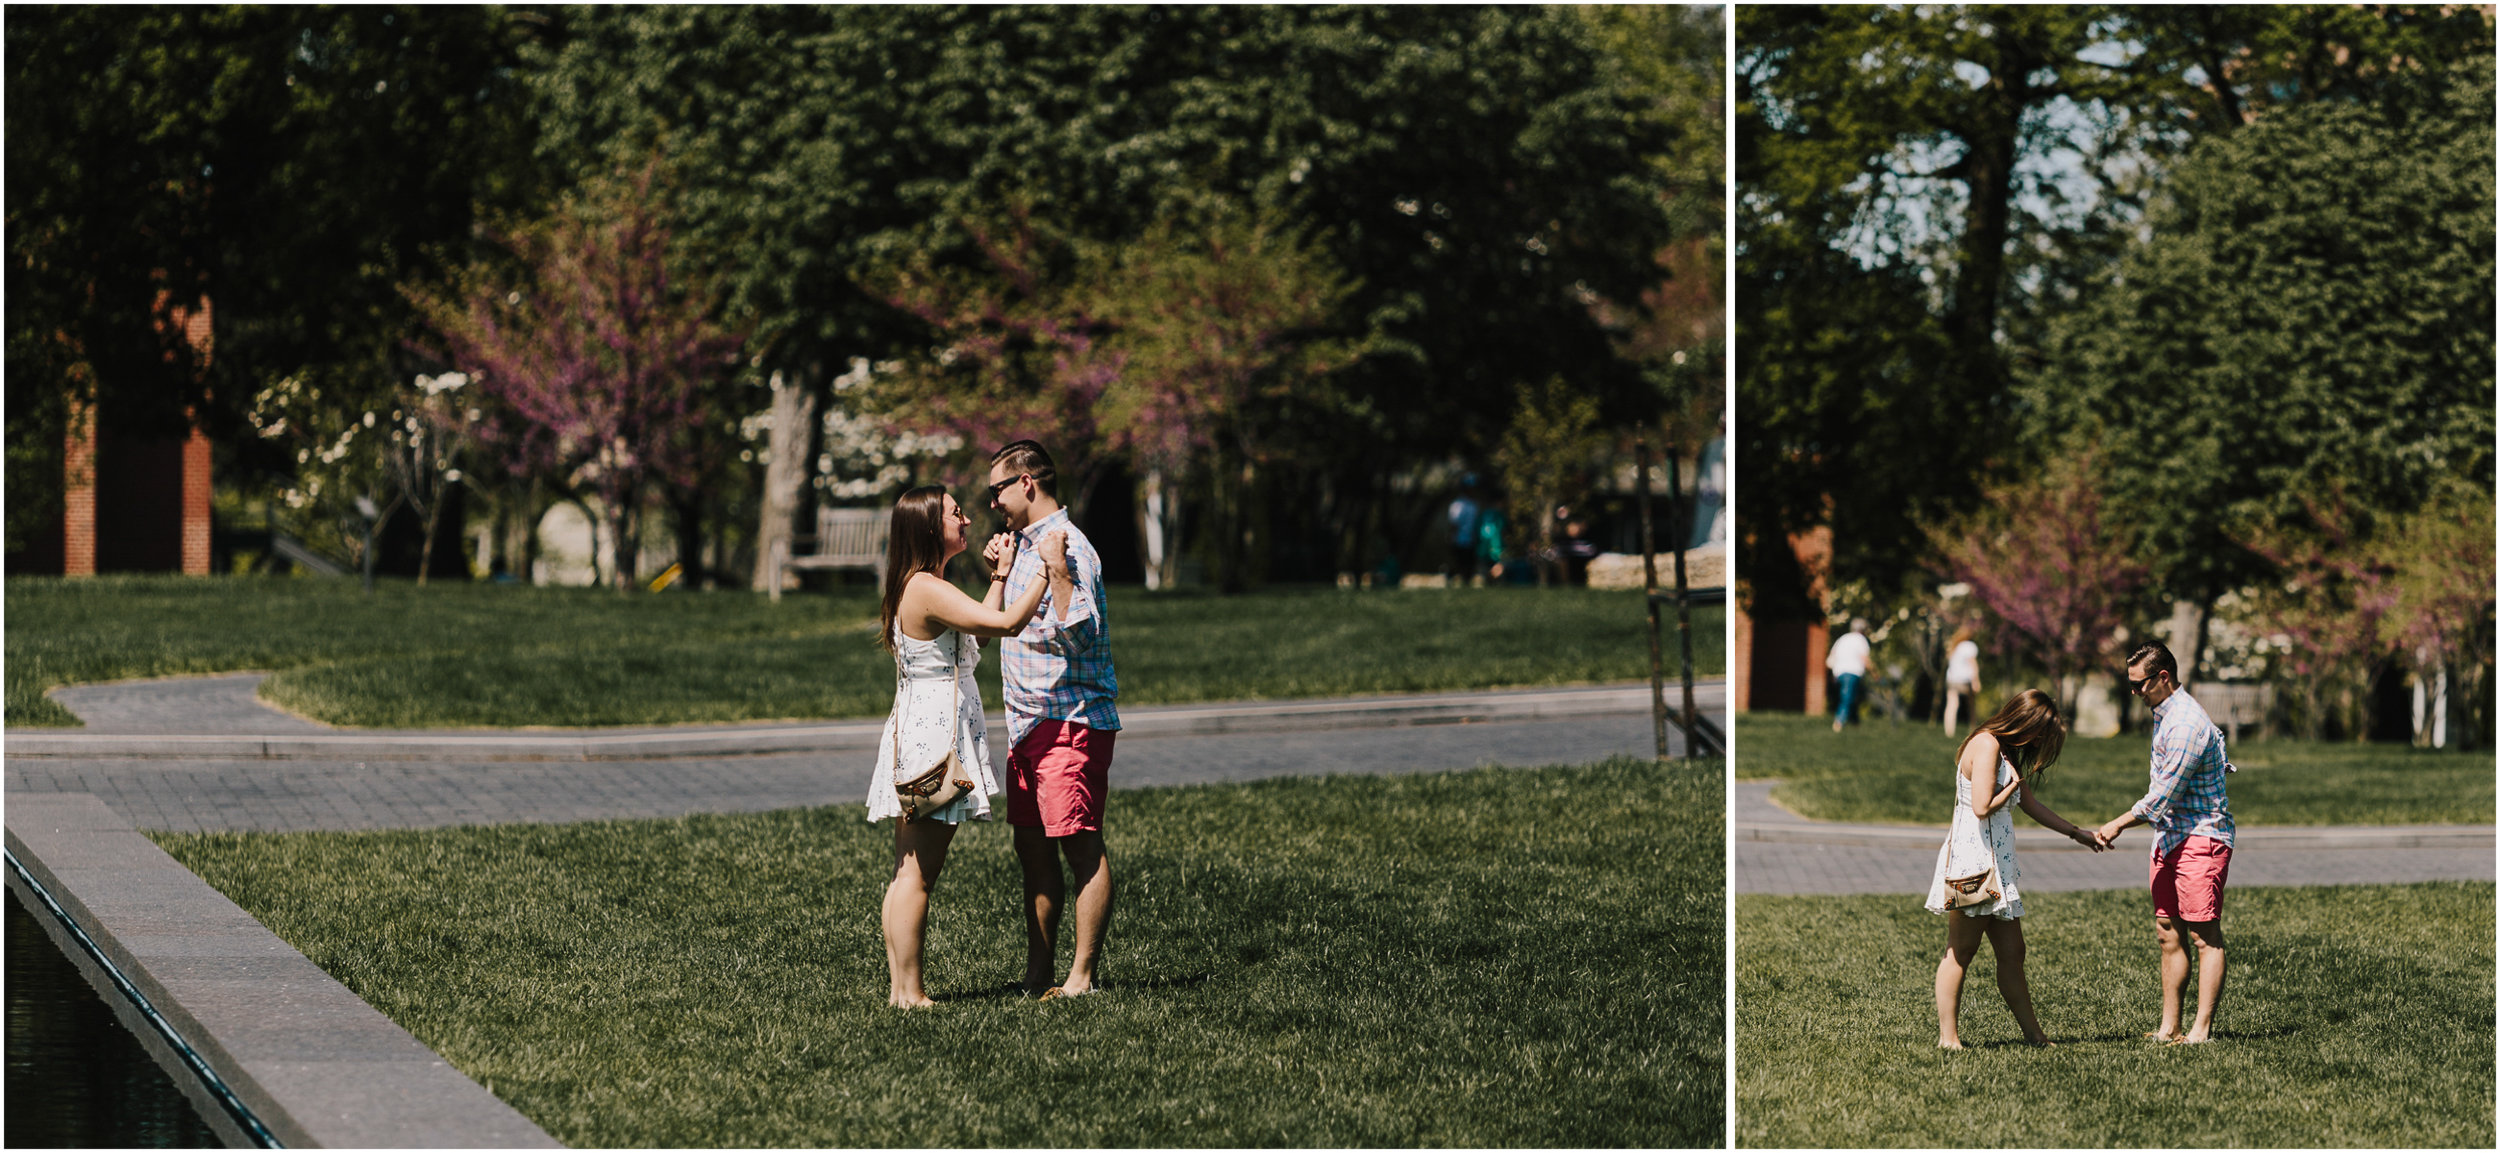 alyssa barletter photography proposal nelson atkins museum kansas city missouri how he asked-1.jpg